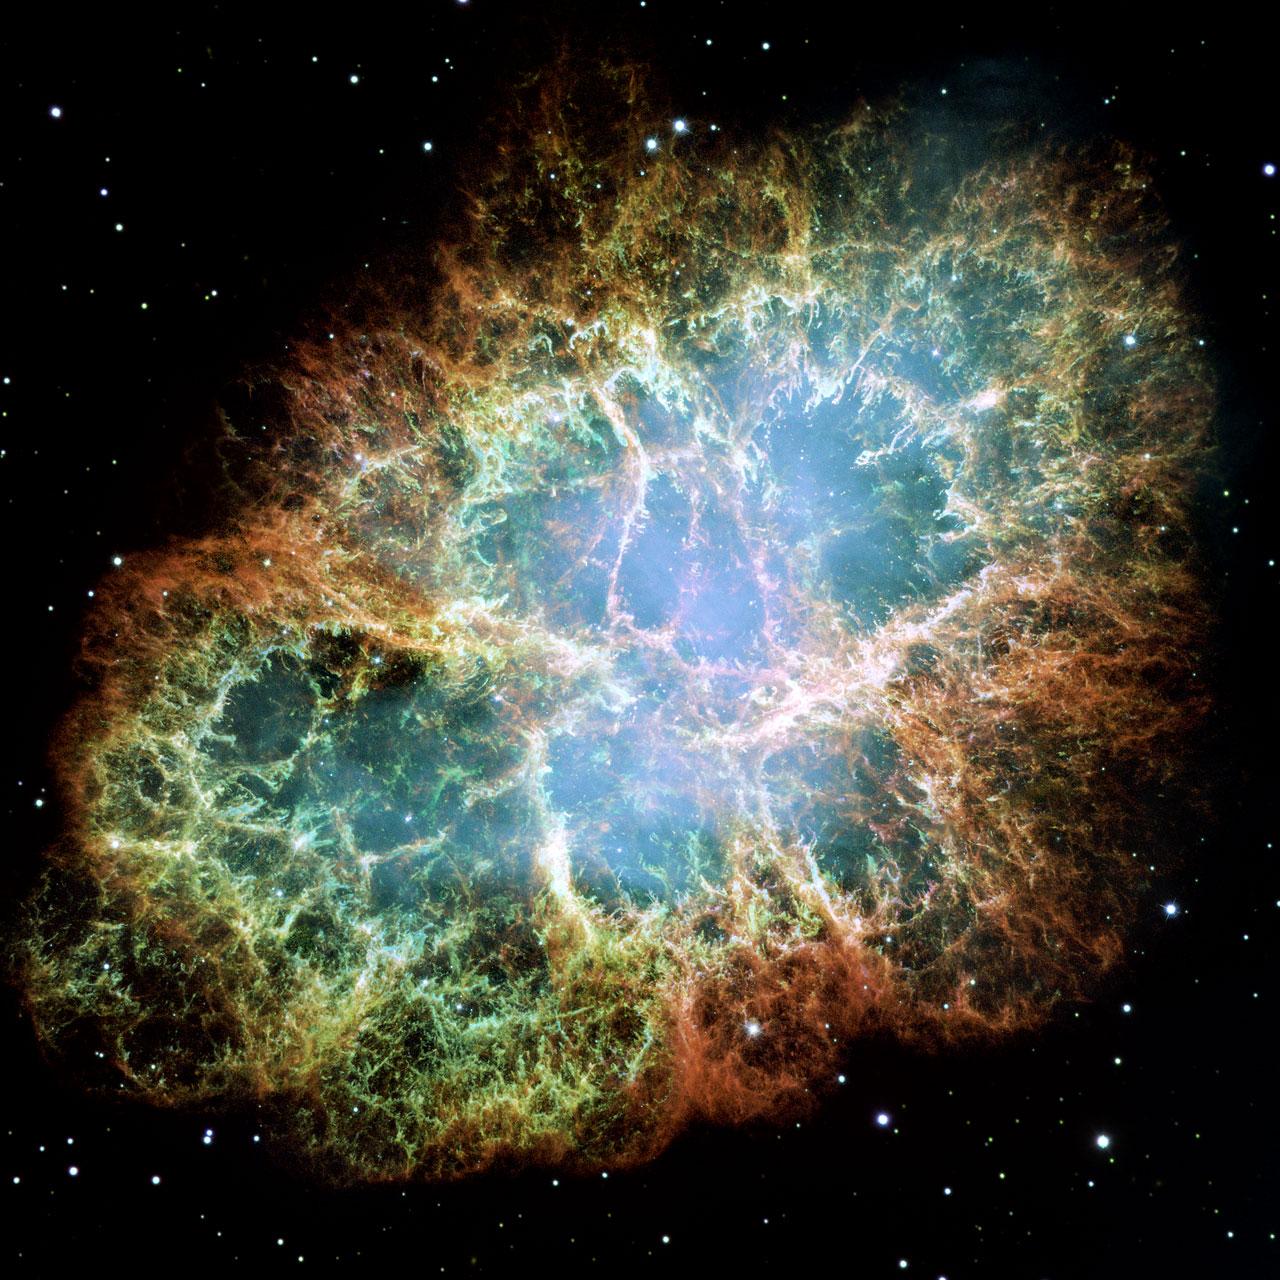 http://2.bp.blogspot.com/_a1n-_cIpzLE/S8JzY8tywrI/AAAAAAAAAT4/ZimPYg_4esw/s1600/crab-nebula.jpg